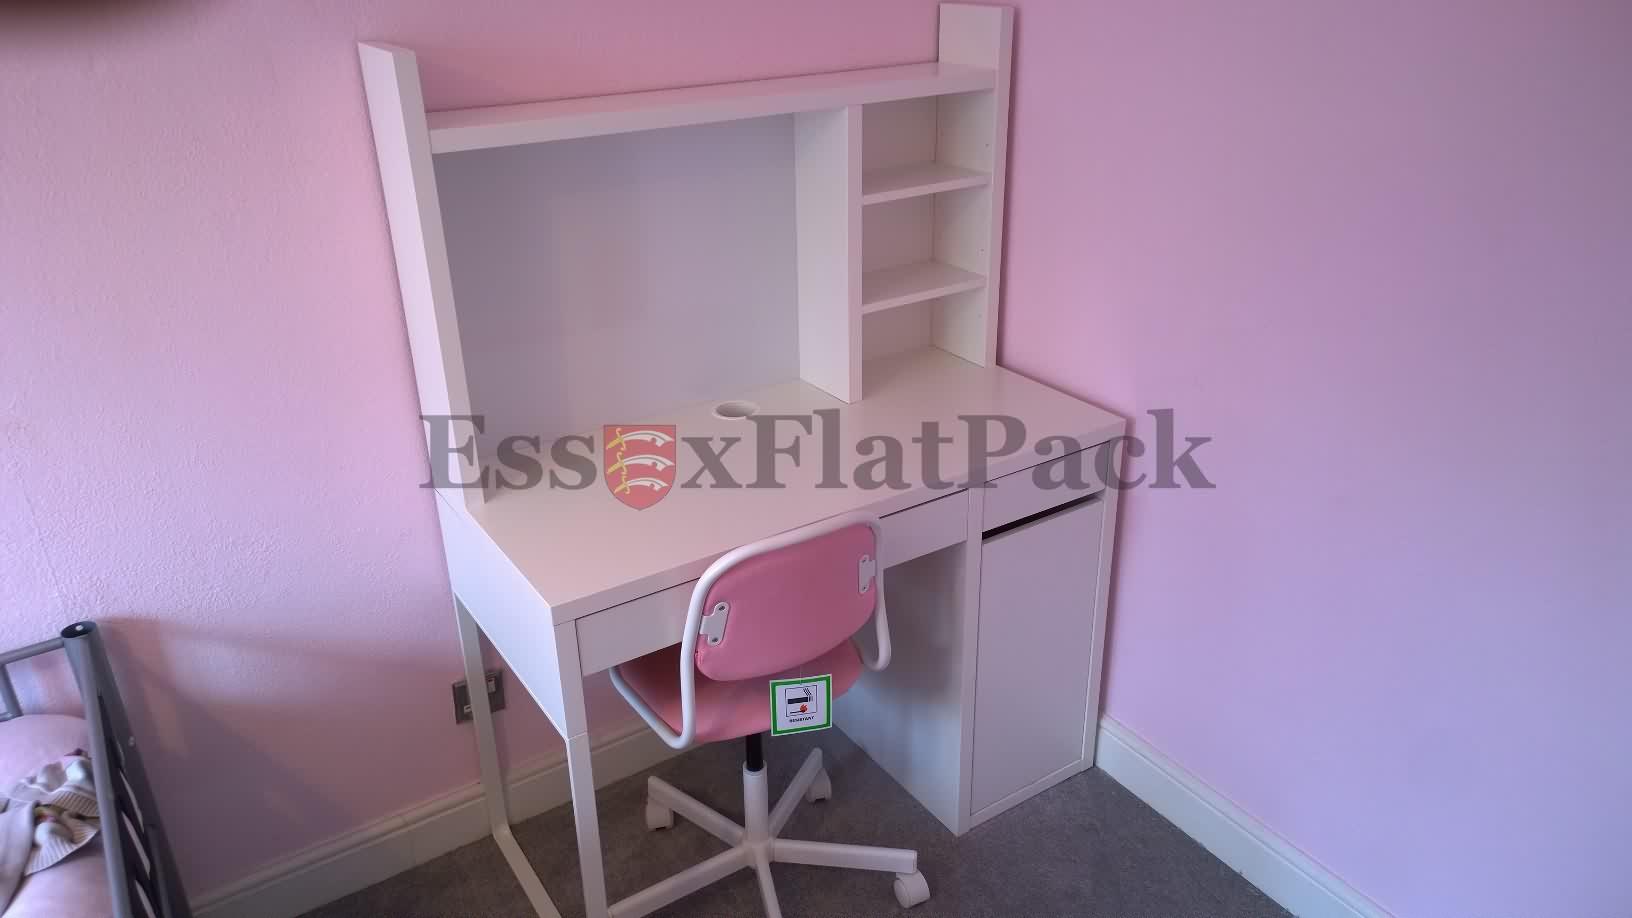 essexflatpack-furniture-20170929125154.jpg